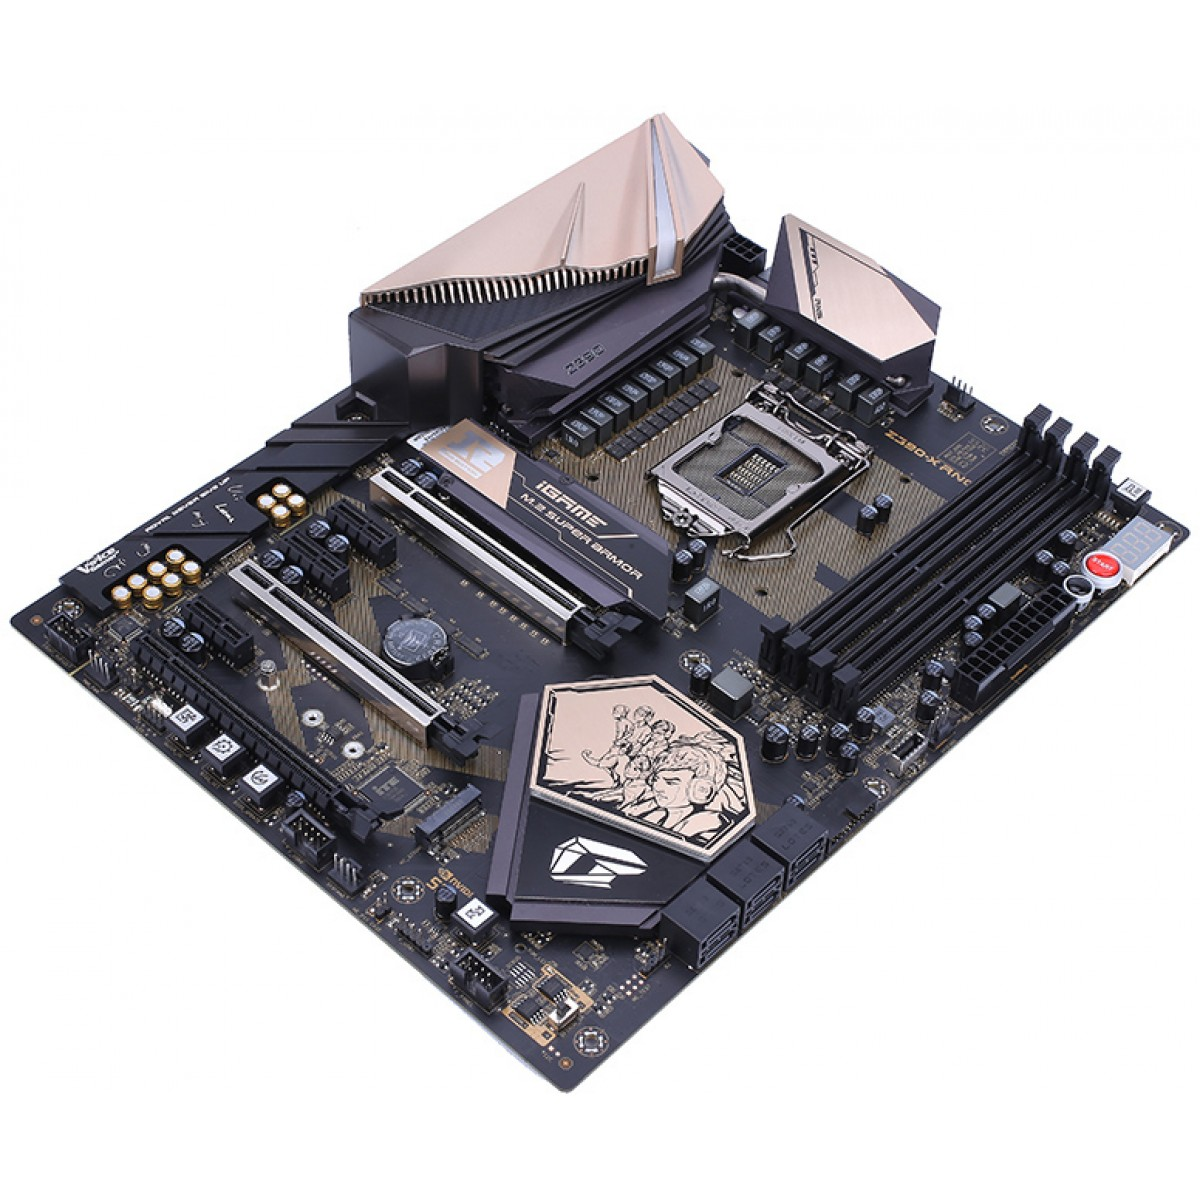 Placa Mãe Colorful iGame Z390-X RNG Edition V20, Chipset Z390, Intel LGA 1151, ATX, DDR4